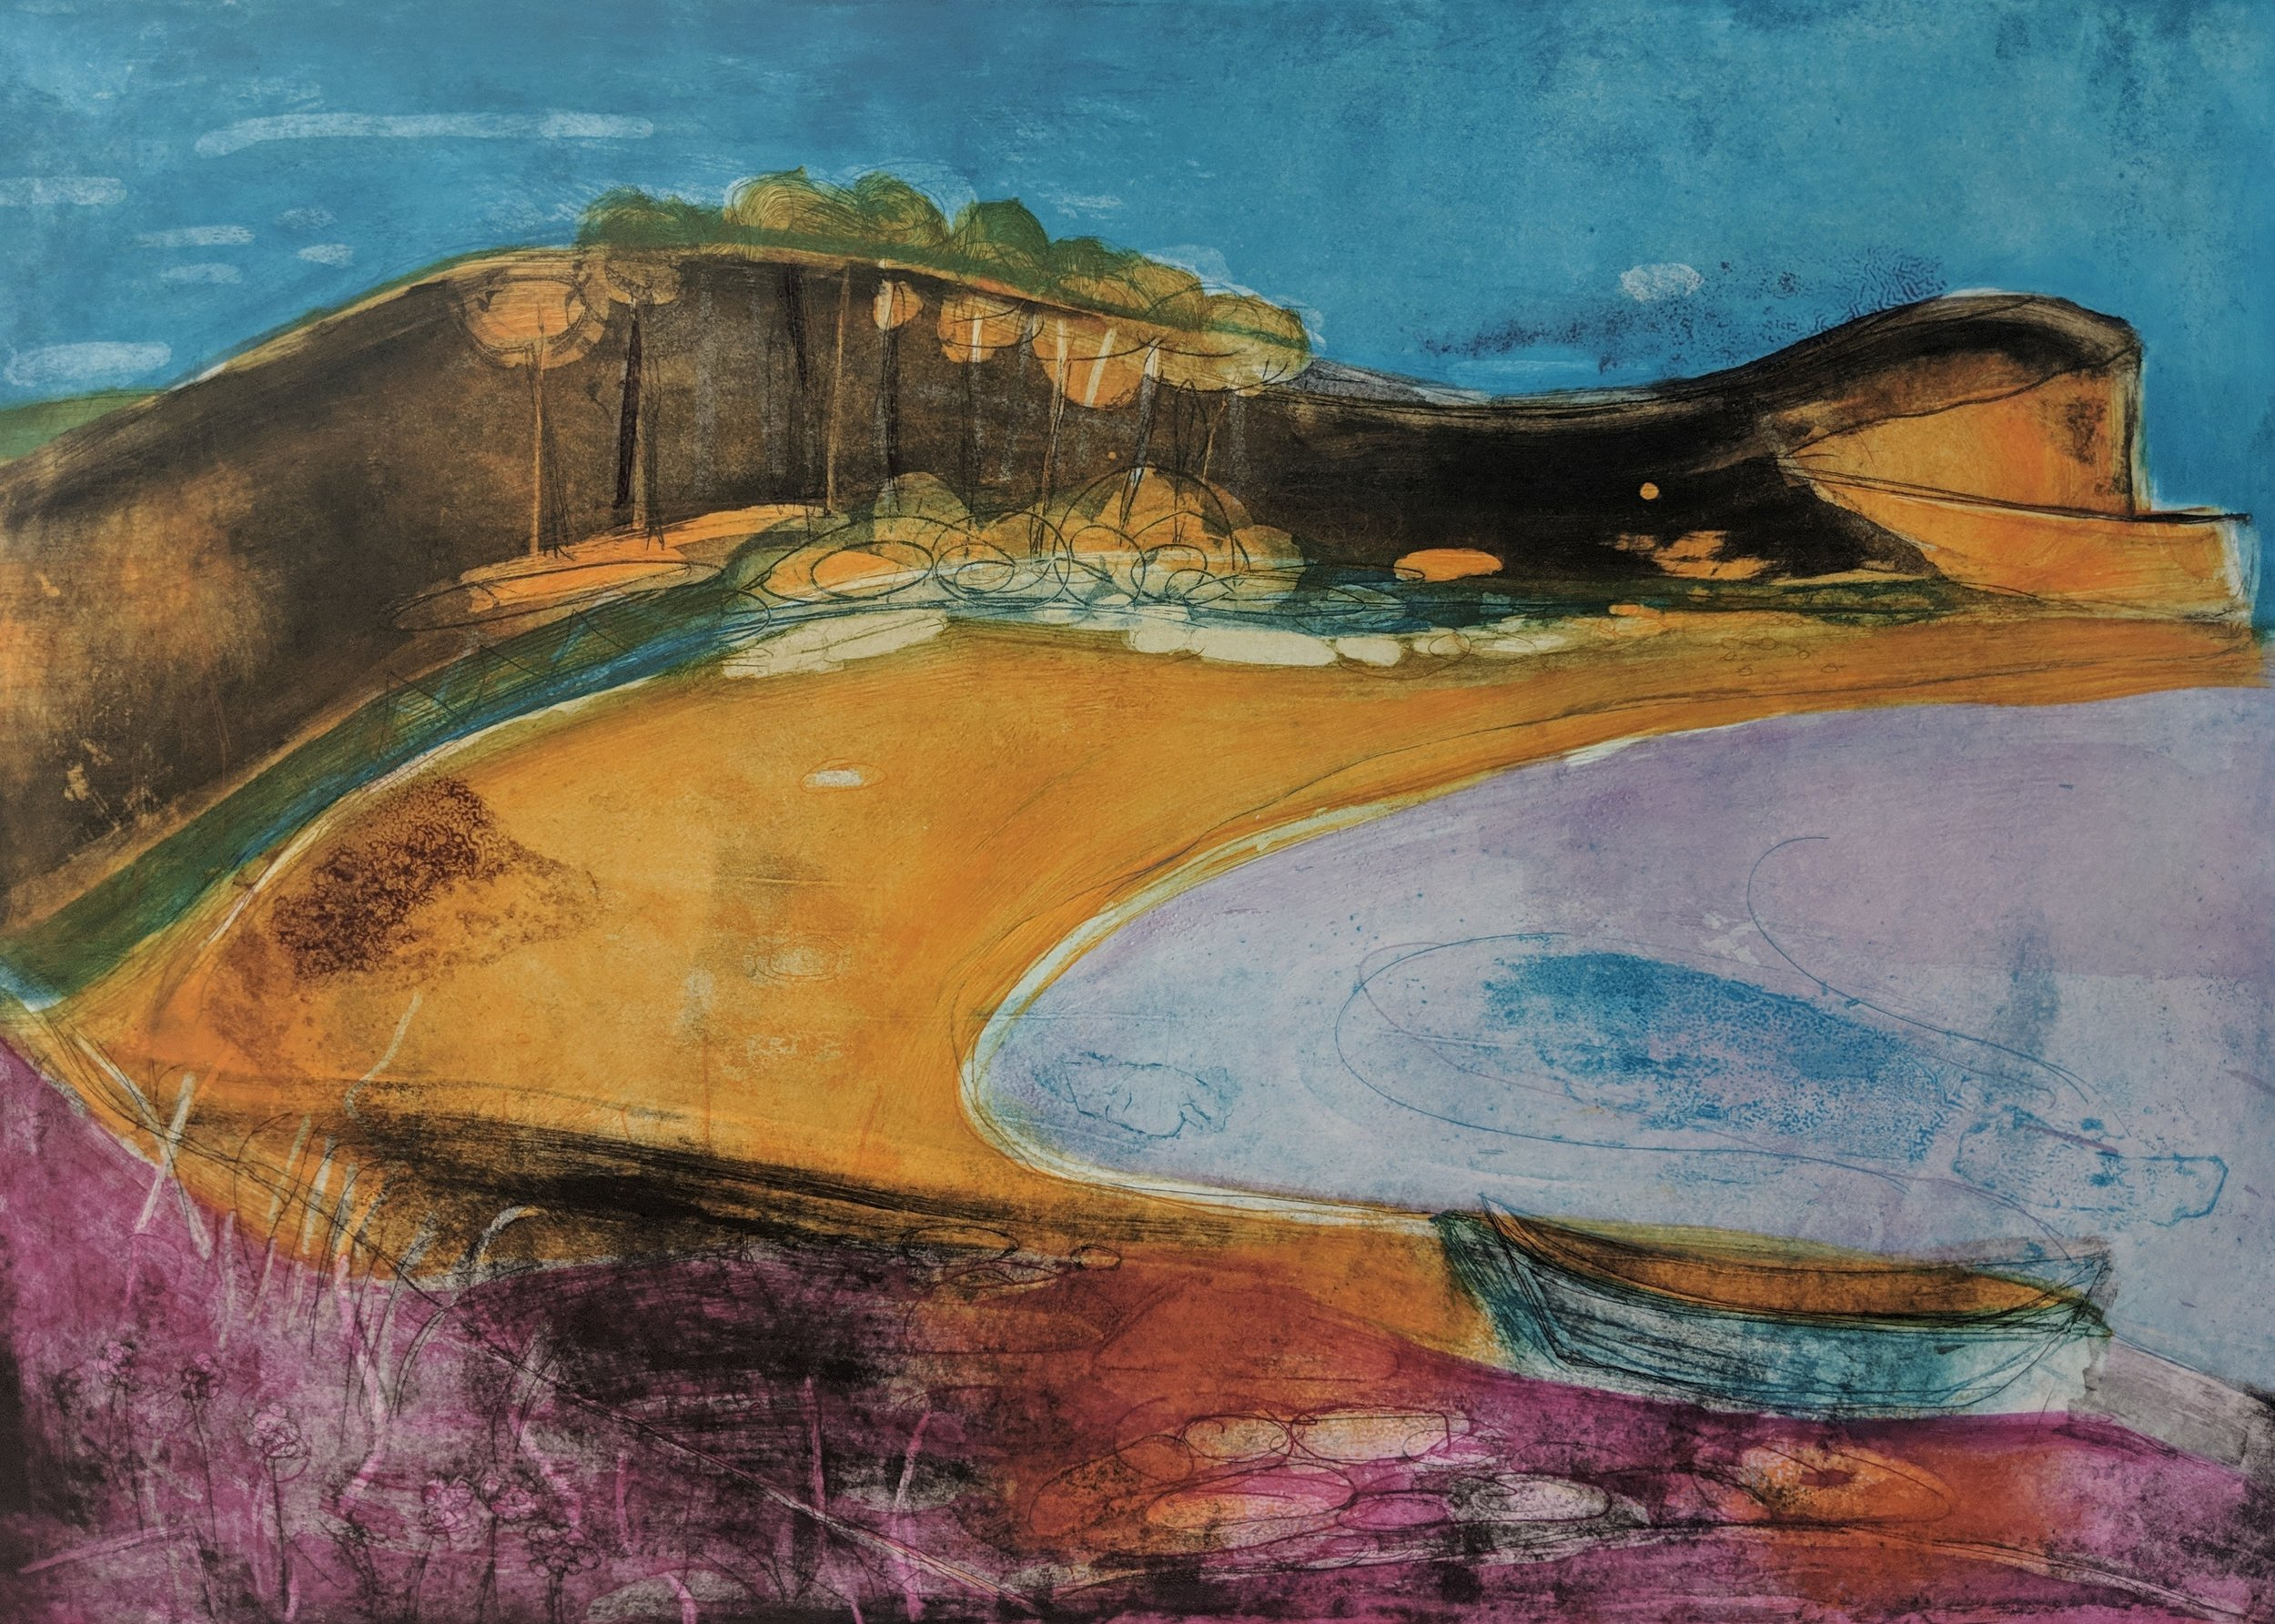 Artist: Louise Davies  Title: Summer Shorelines  Size: 50 x 70 cm  Medium: Etching (edition 9 / 75)  Price: £660 fr